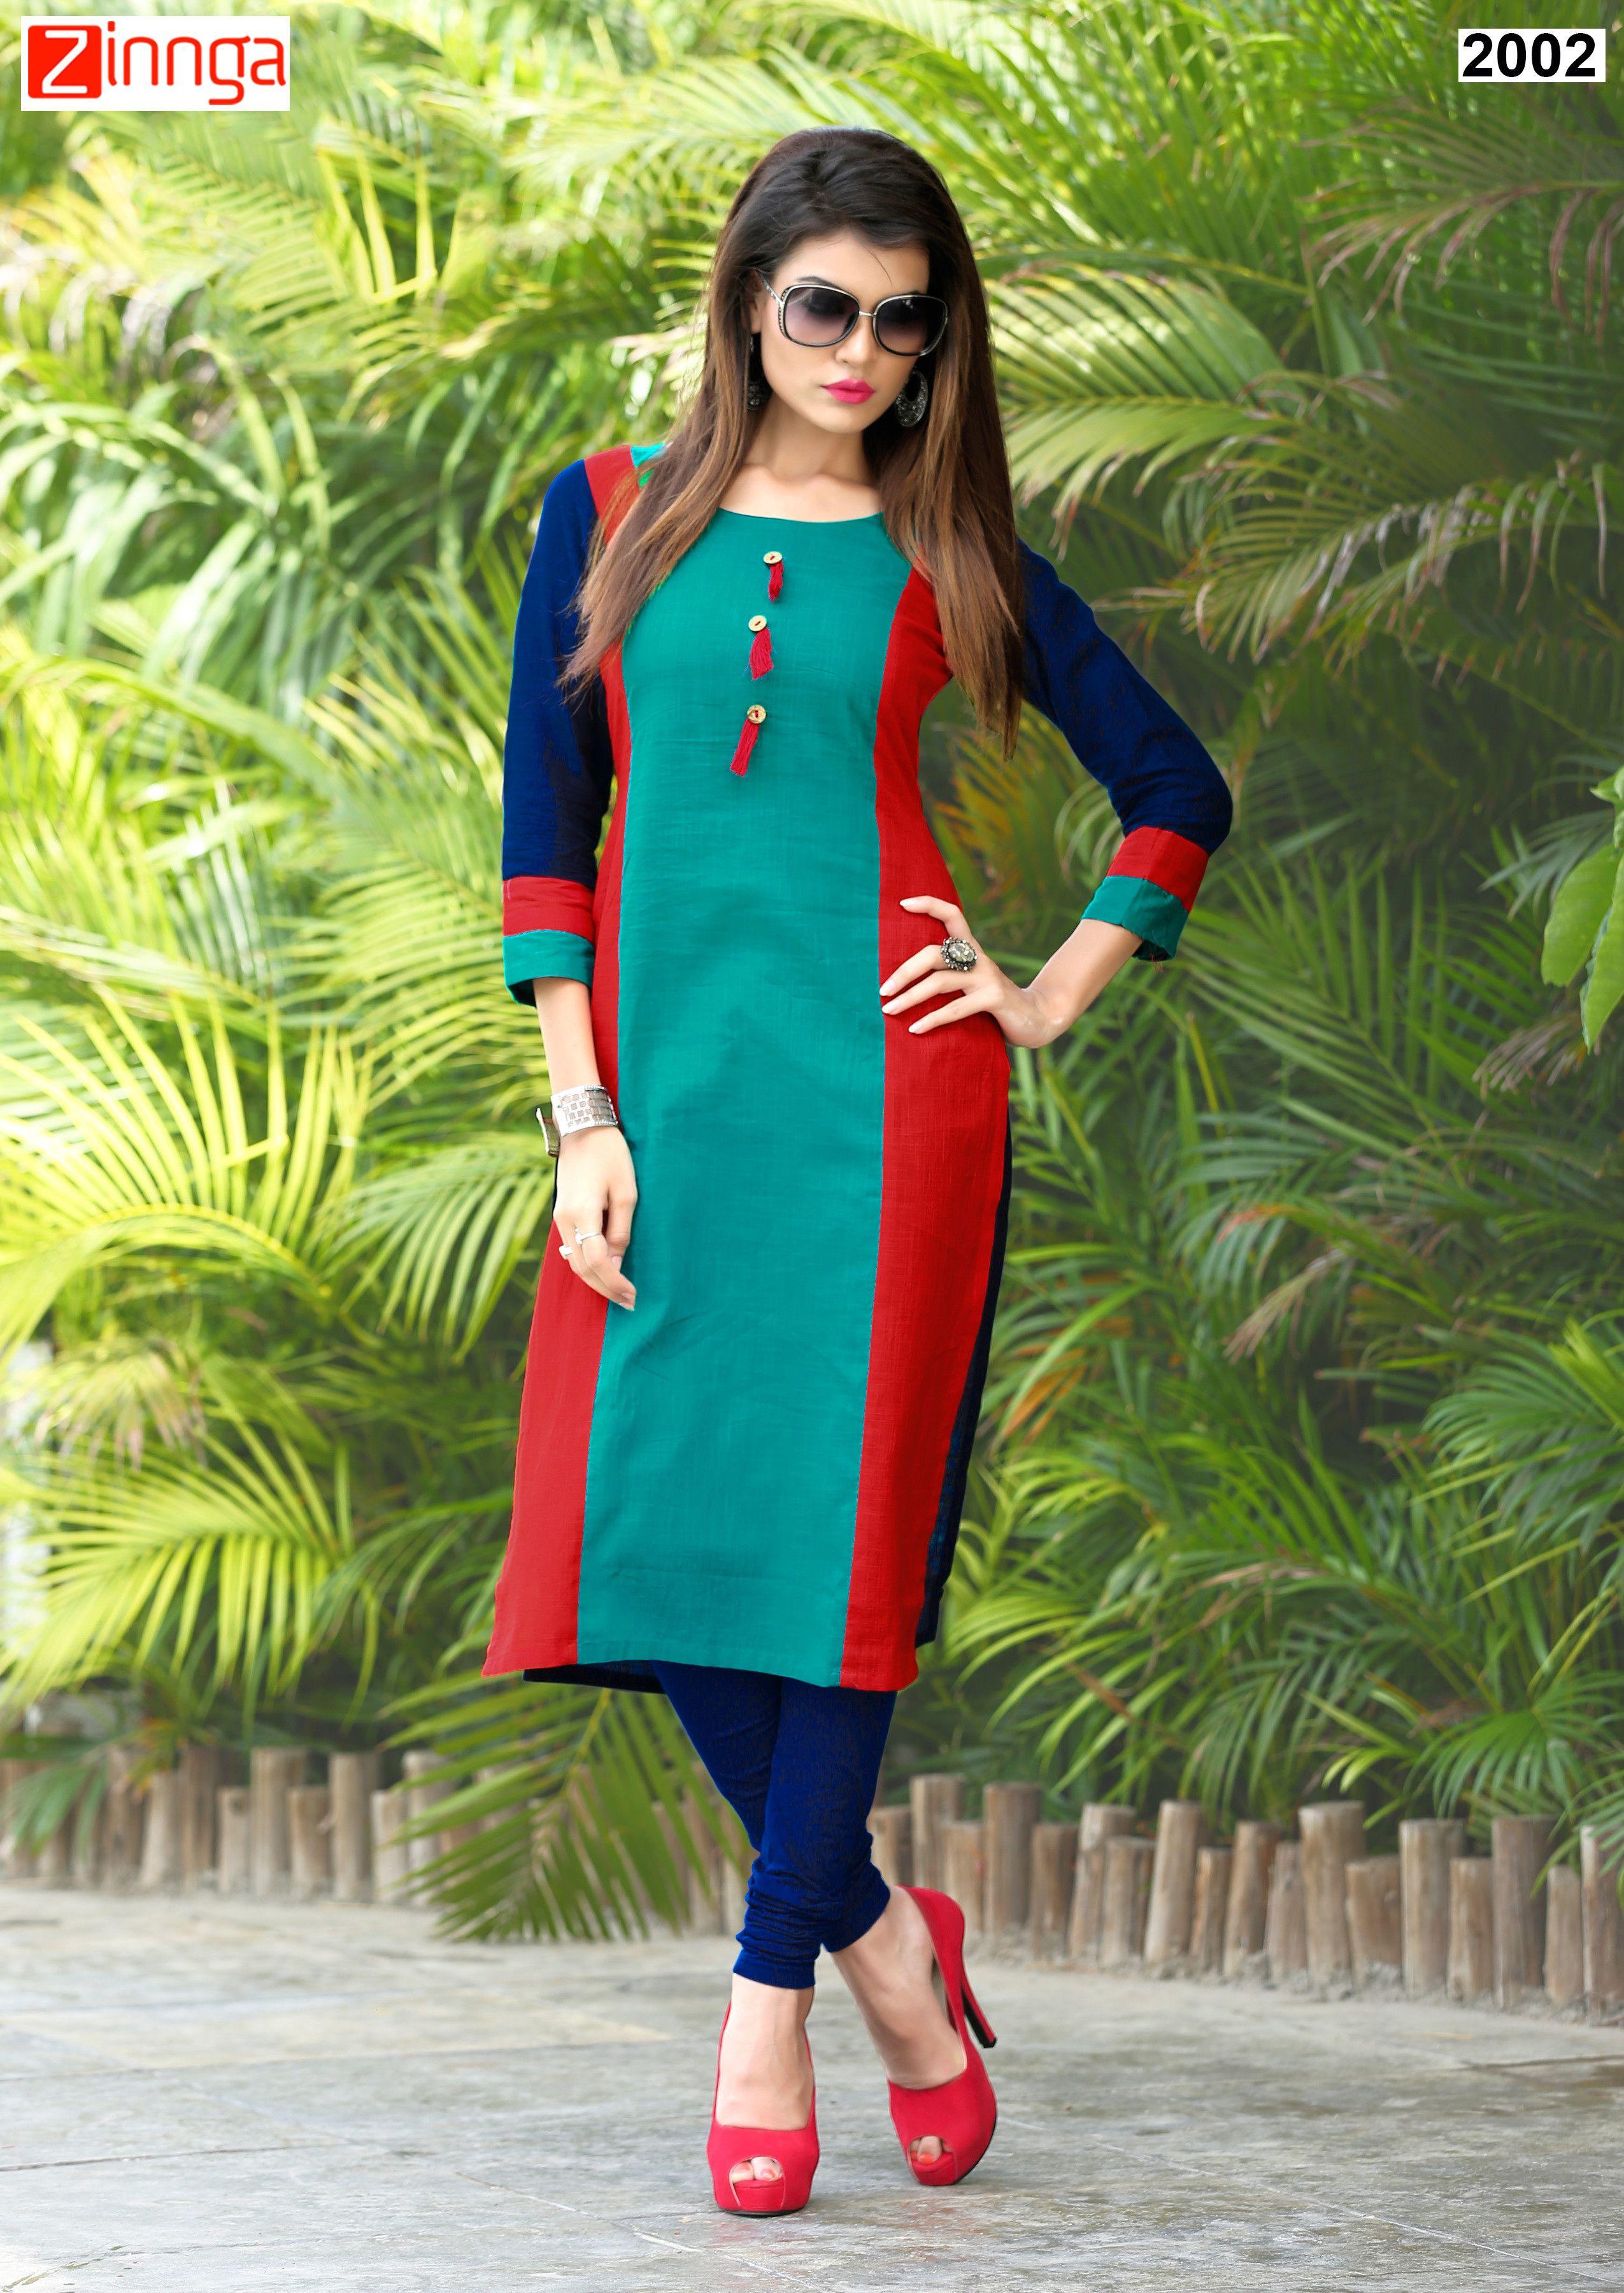 66adf6f08b Multi Color Slub Cotton Kurti #kurti #kurtis #fashion #zinngafashion  #latest #new #goodlook #goodlooking #trend #nicelook